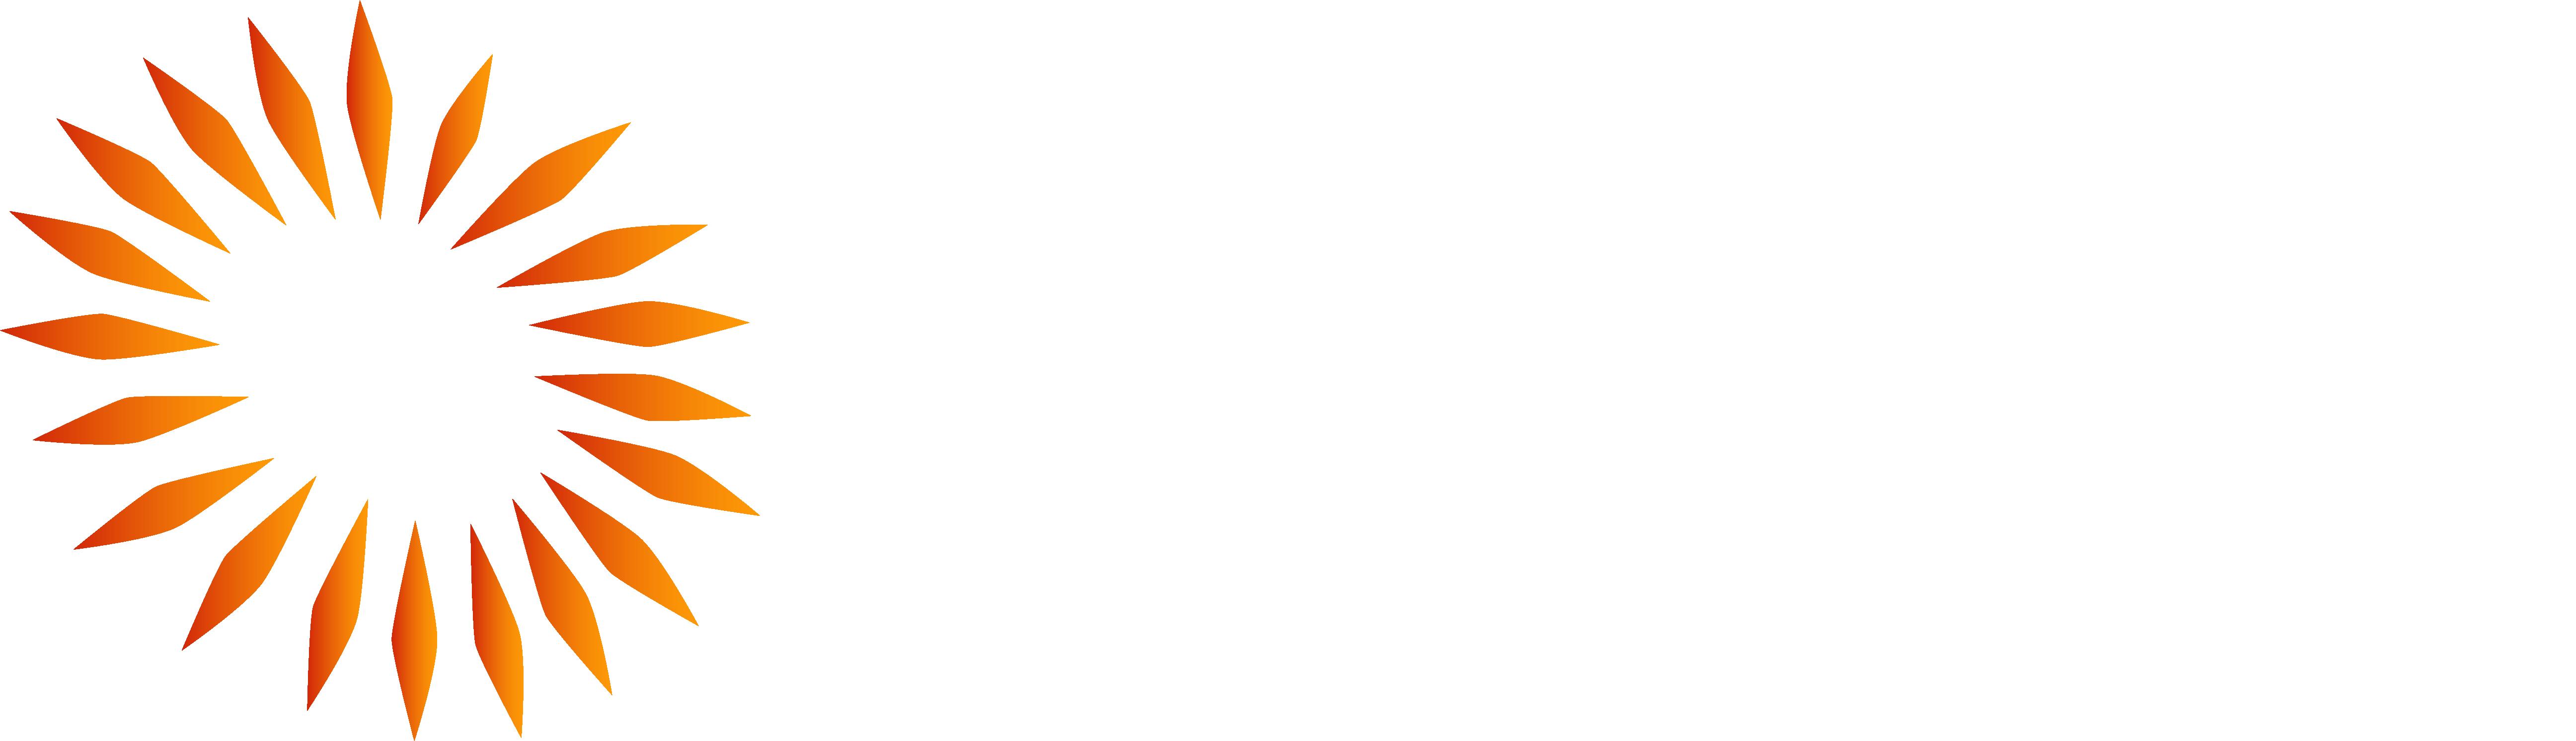 Imagine Events DMC